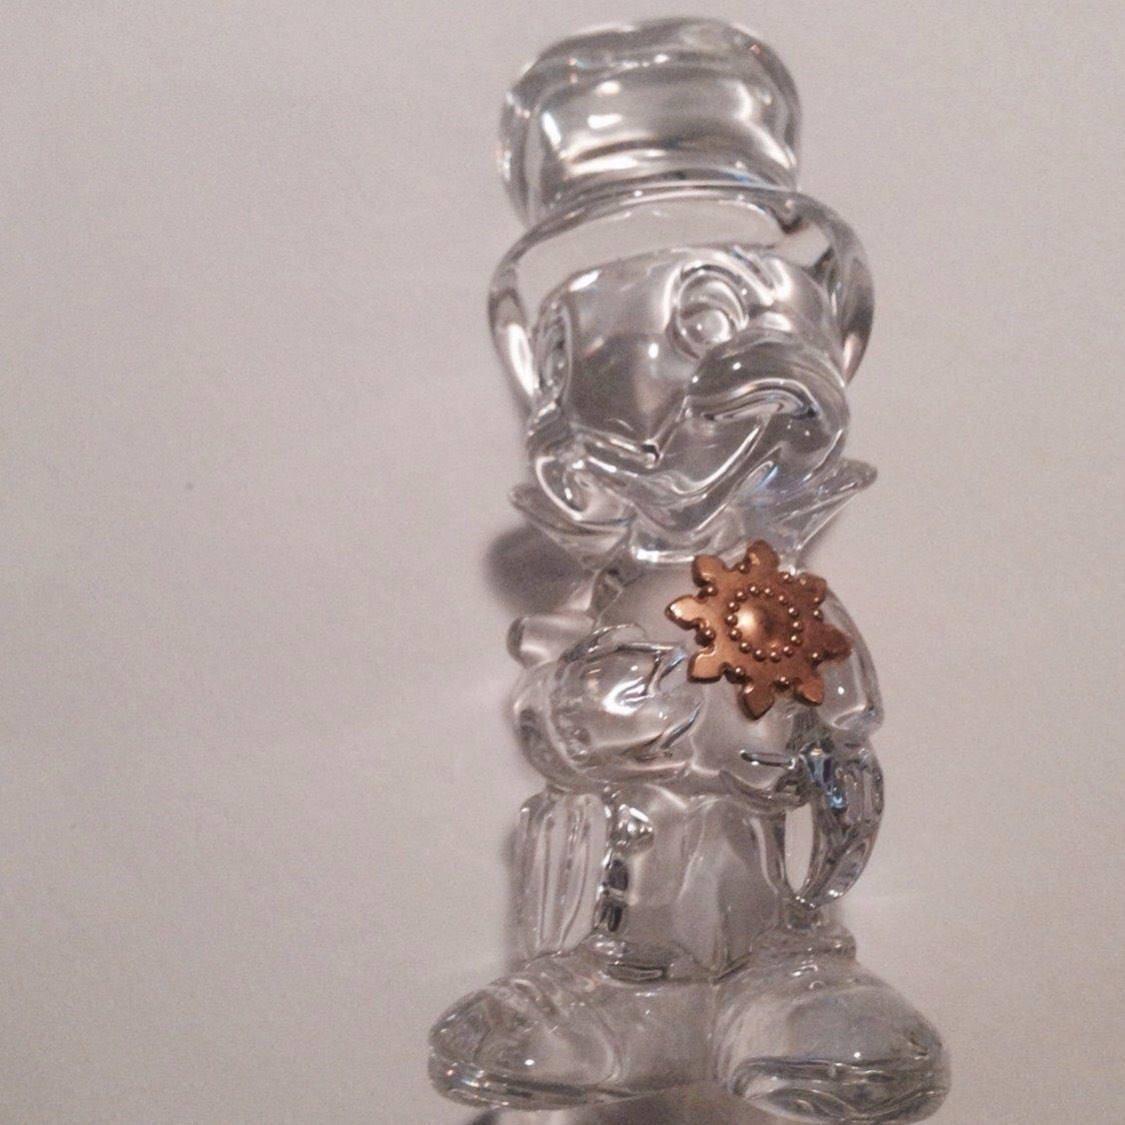 9a8262012f2bf9 JIMINY CRICKET RARE Crystal Figurine Limited Edition